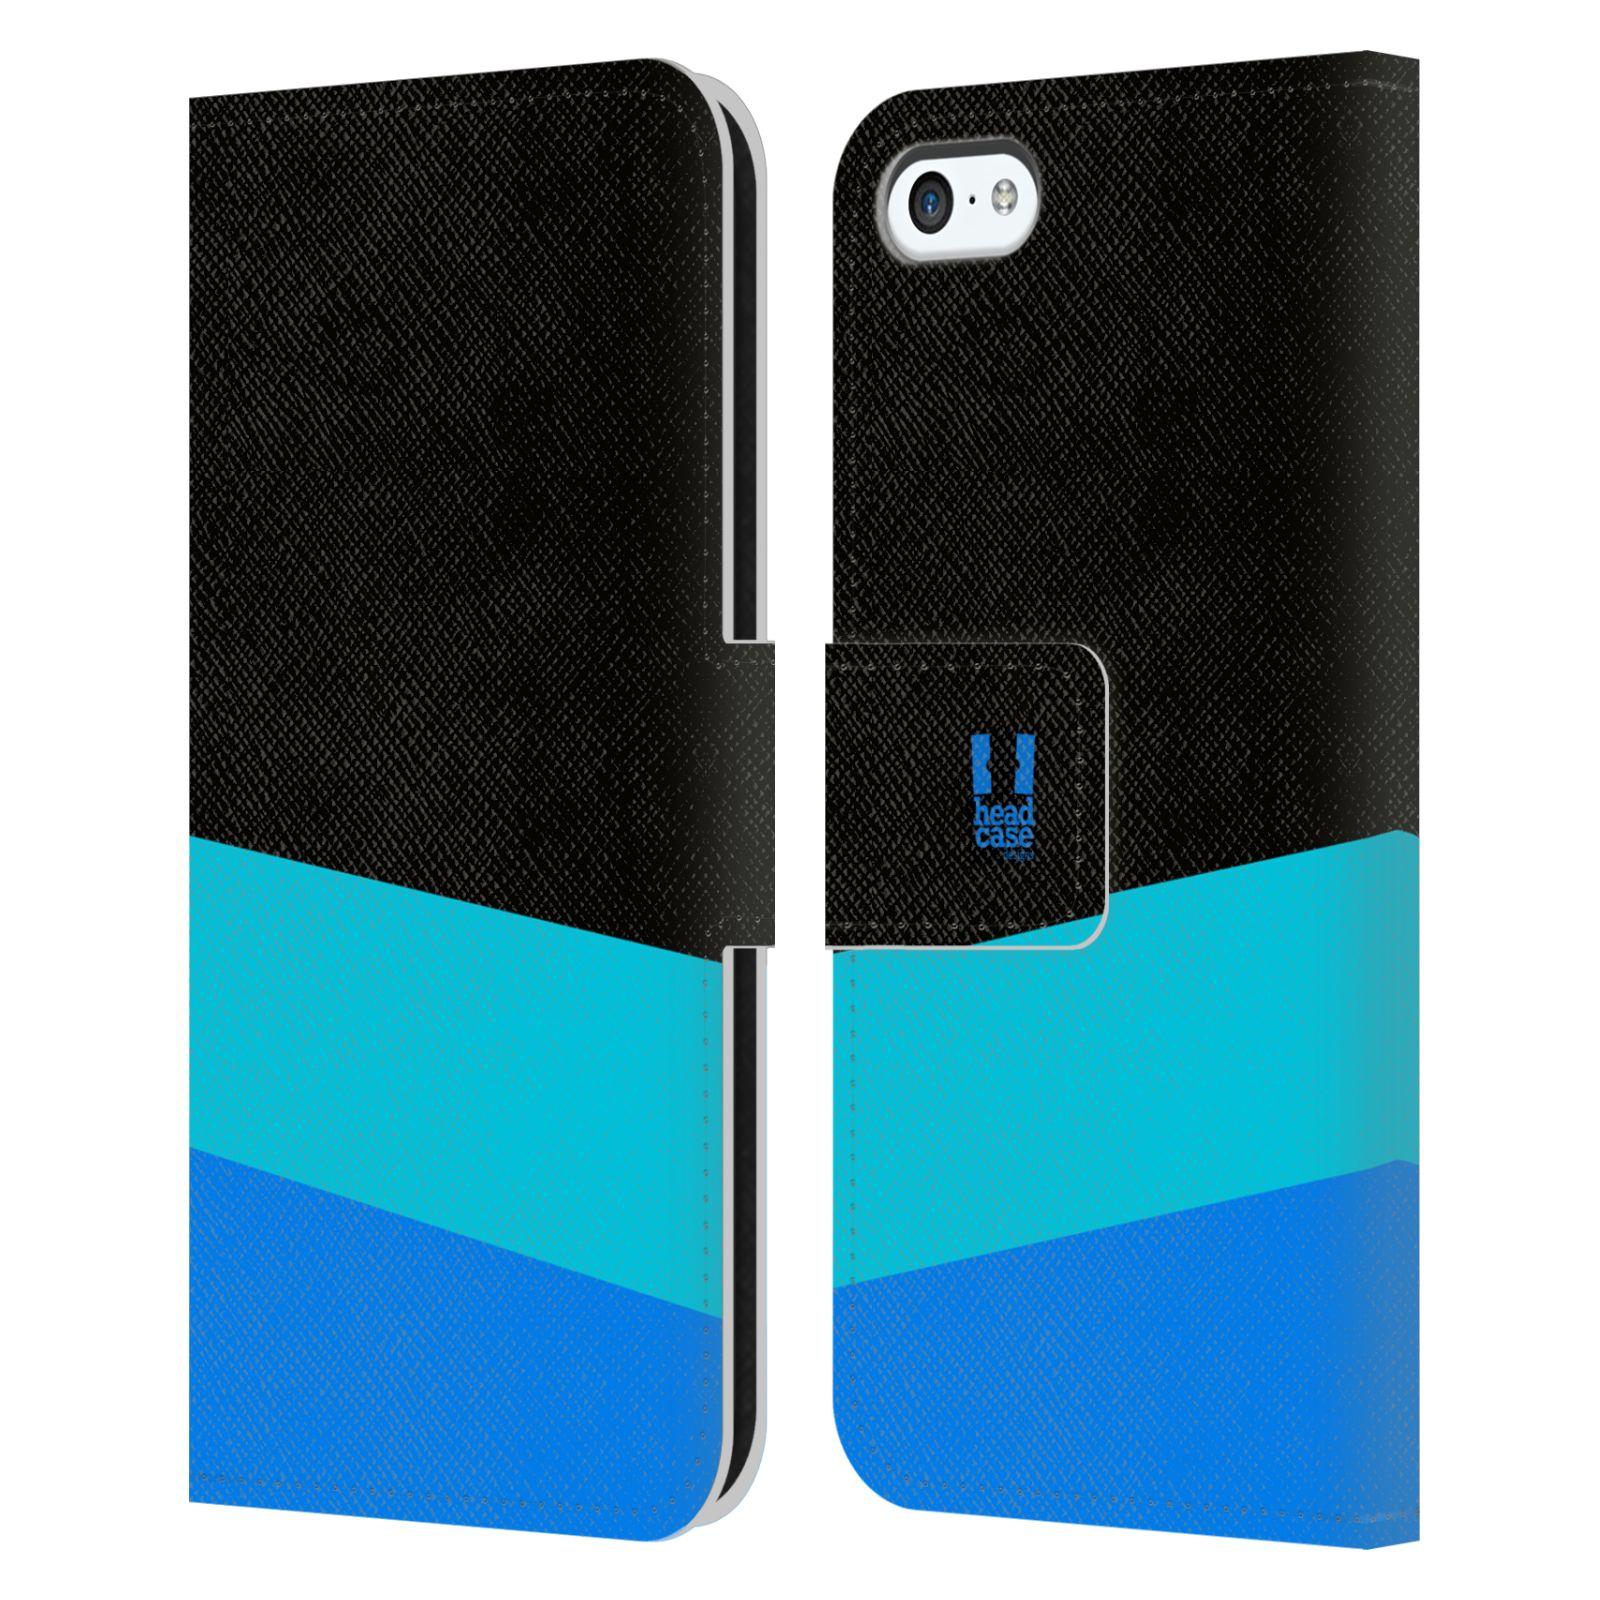 HEAD CASE Flipové pouzdro pro mobil Apple Iphone 5C barevné tvary modrá a černá FORMAL